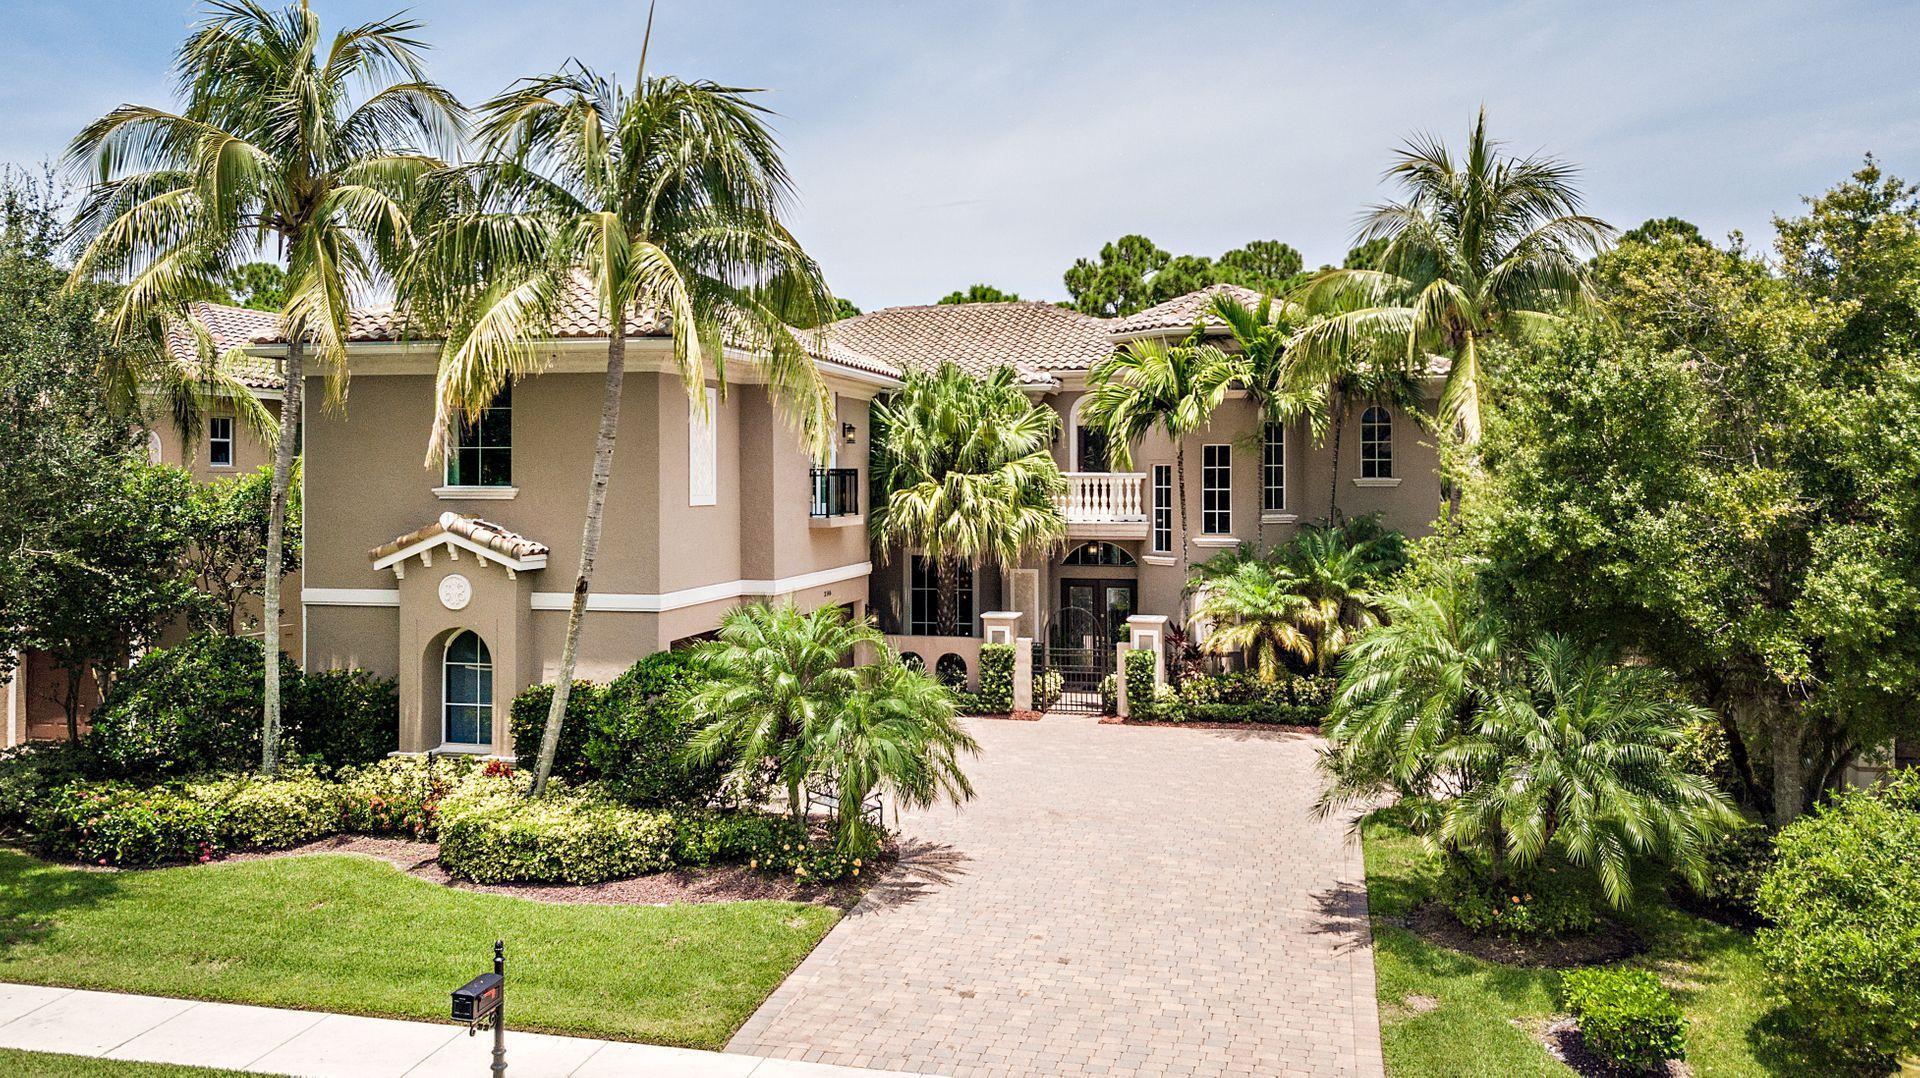 Photo of 3146 San Michele Drive, Palm Beach Gardens, FL 33418